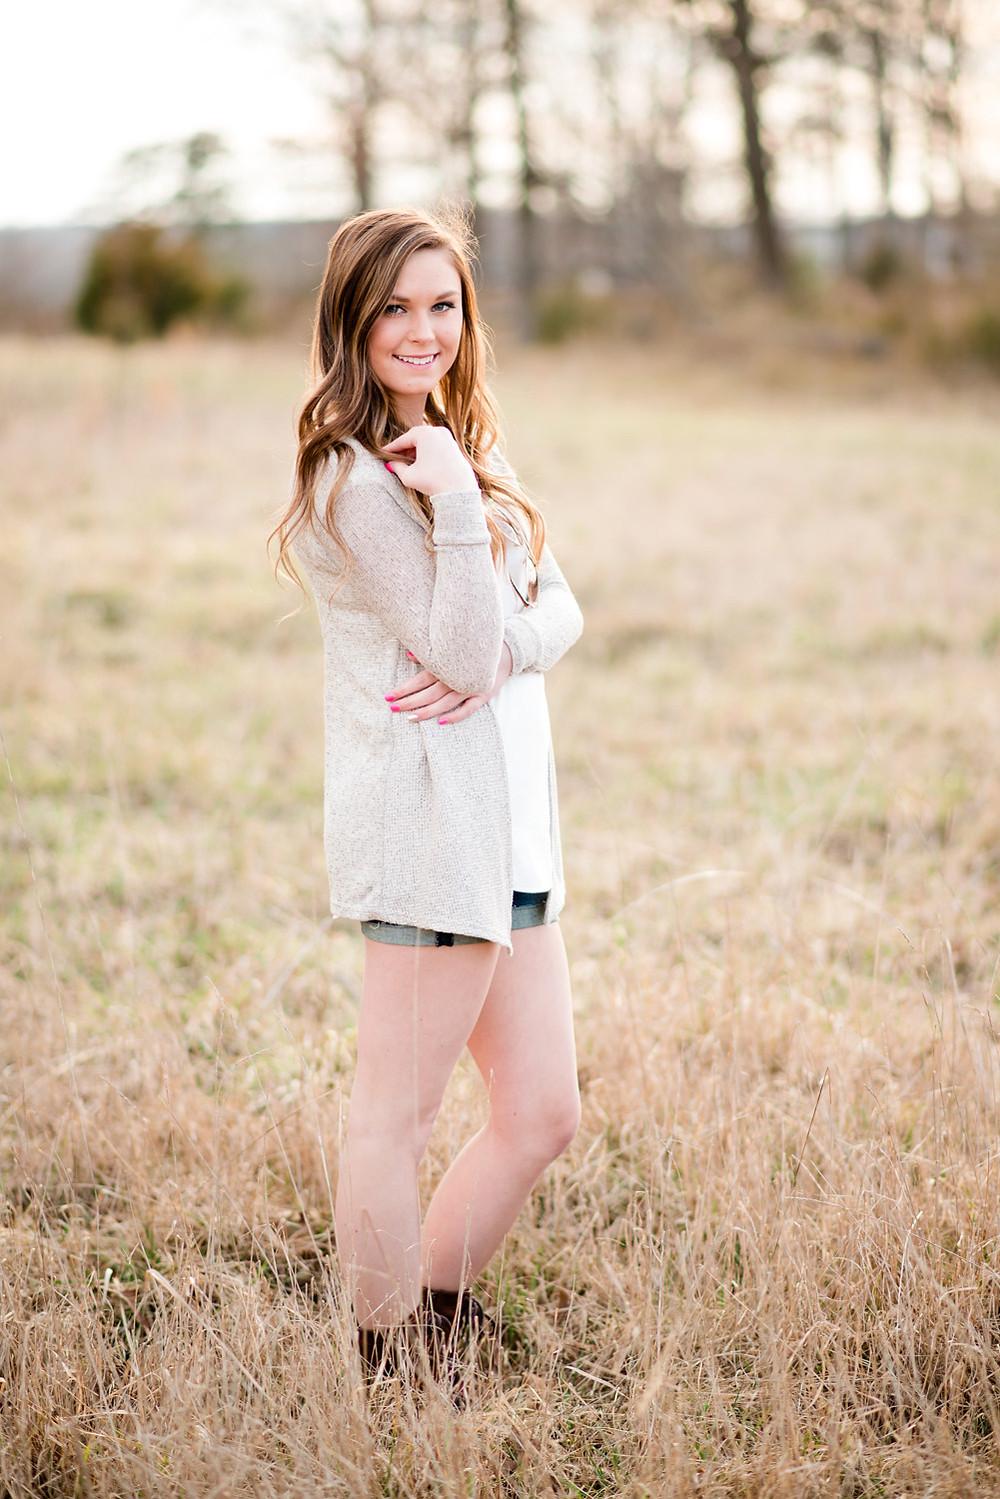 senior photography poses